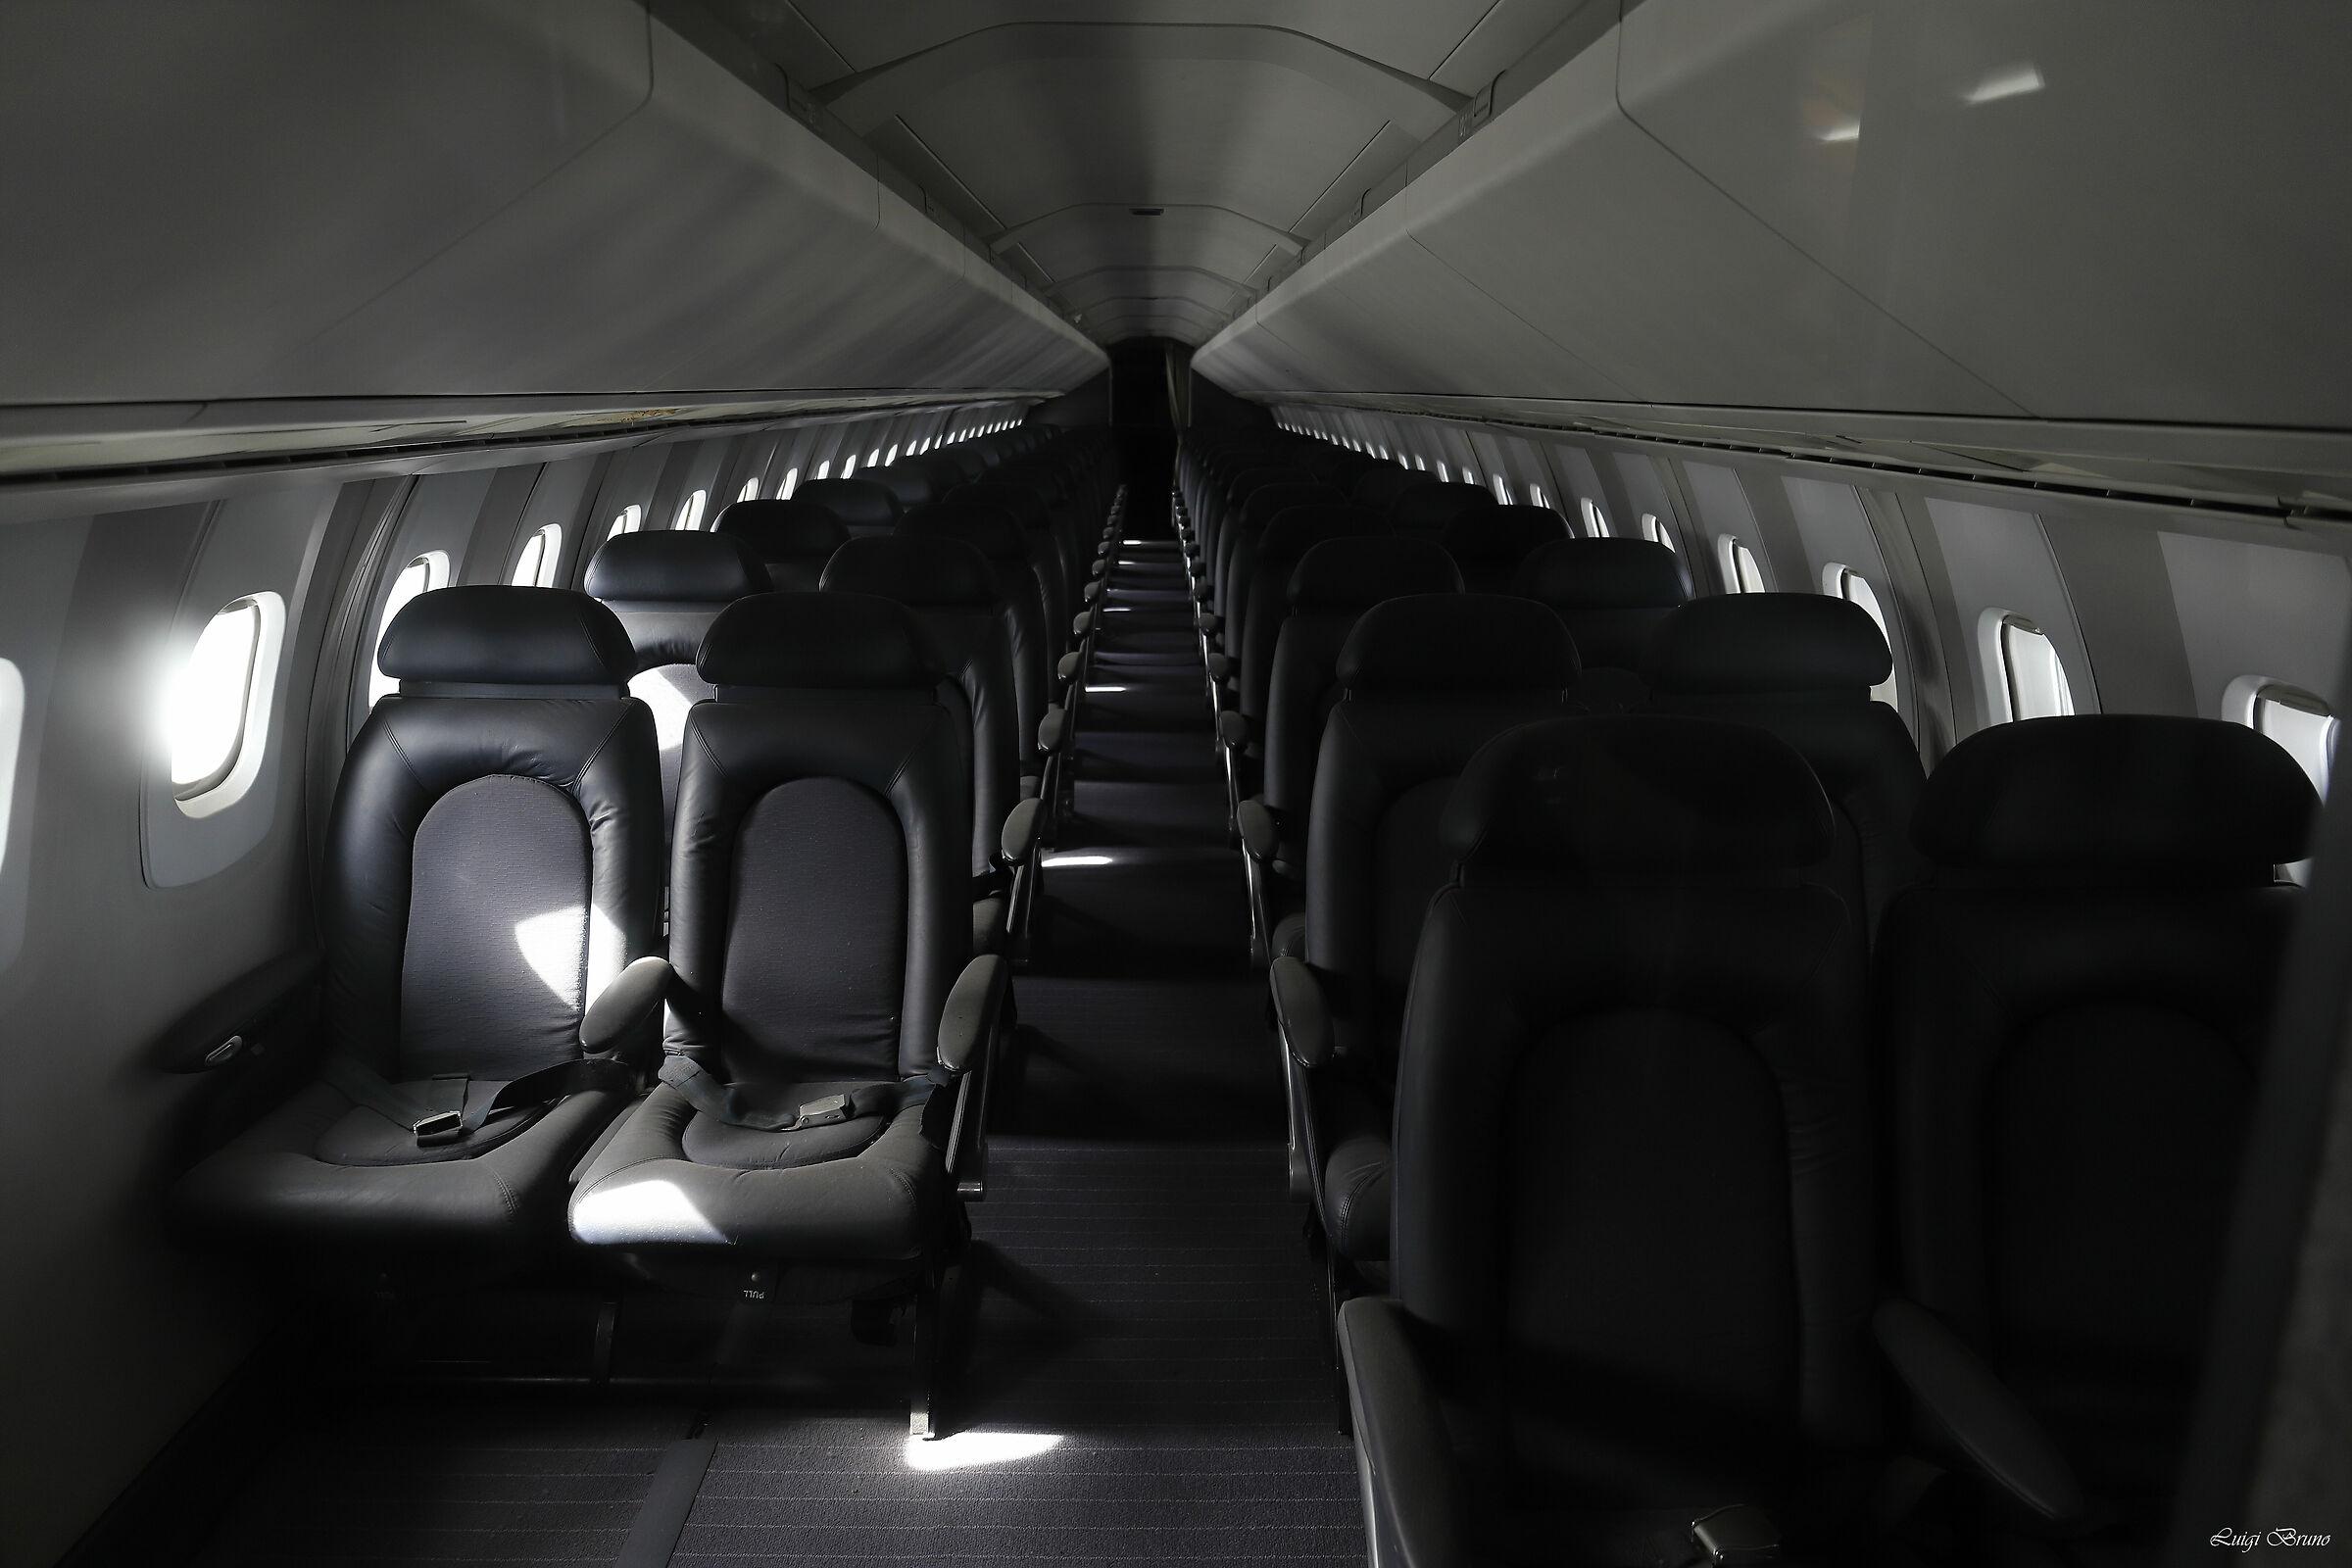 A resting plane...